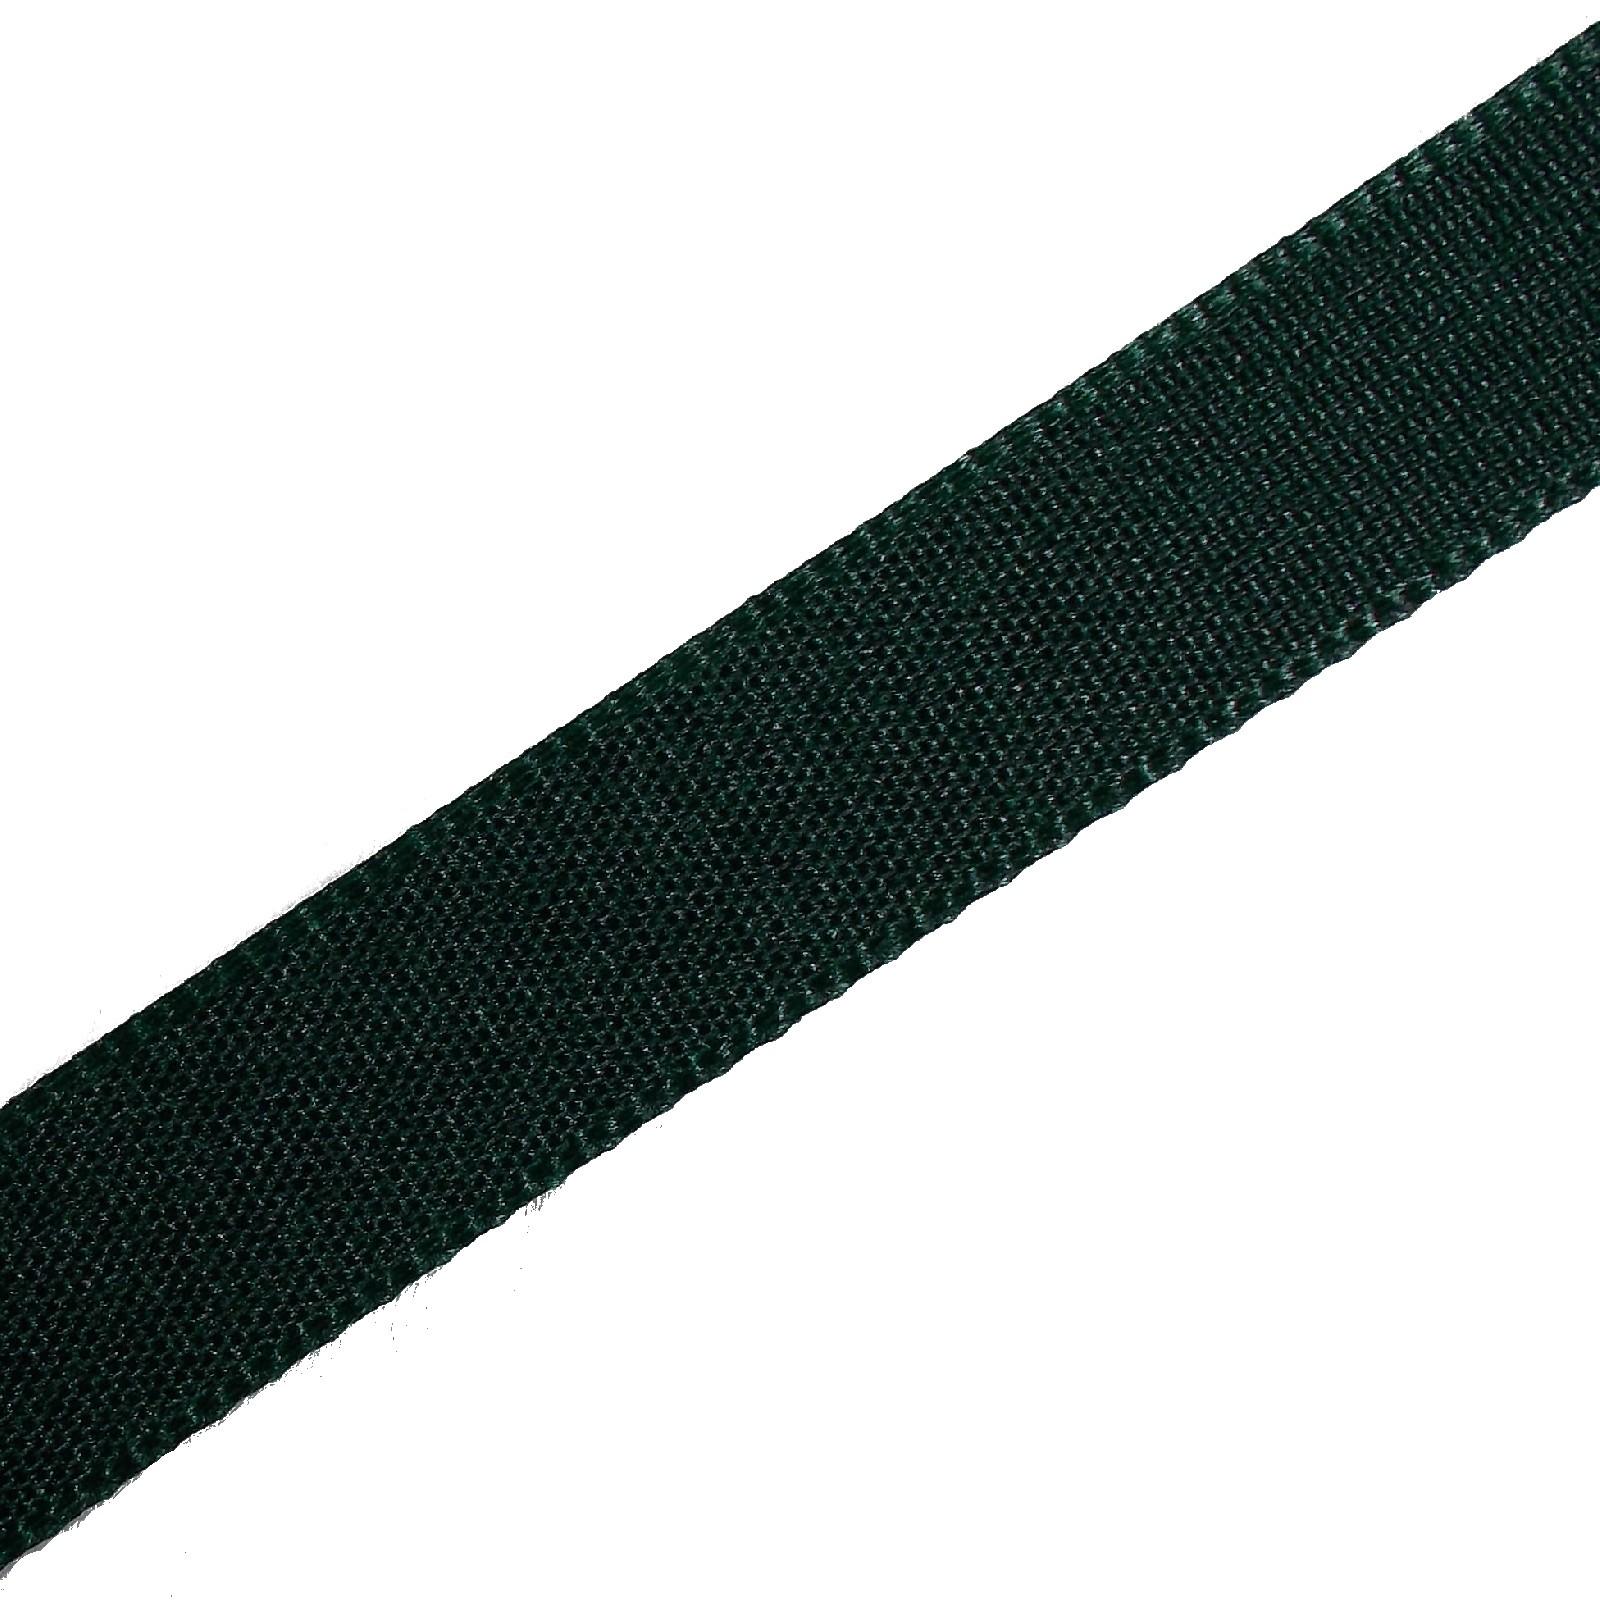 Berisfords Seam Binding Polyester Ribbon Tape 12mm wide Green 2 metre length